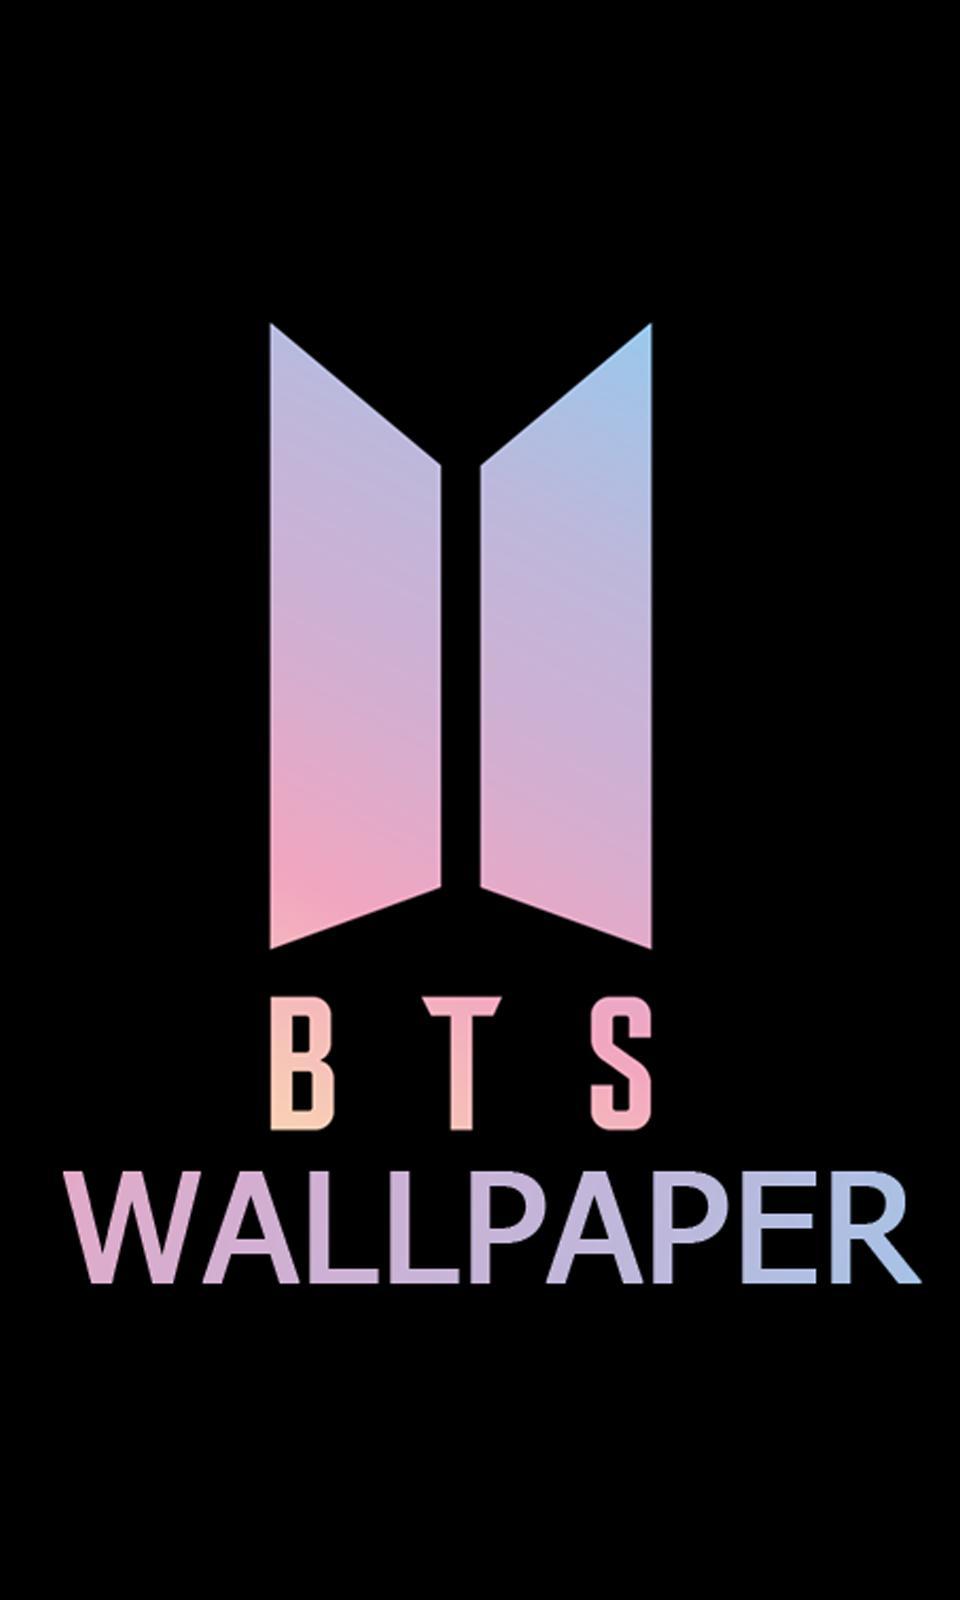 Bts Wallpaper Hd Wallpaper Lock Screen Images For